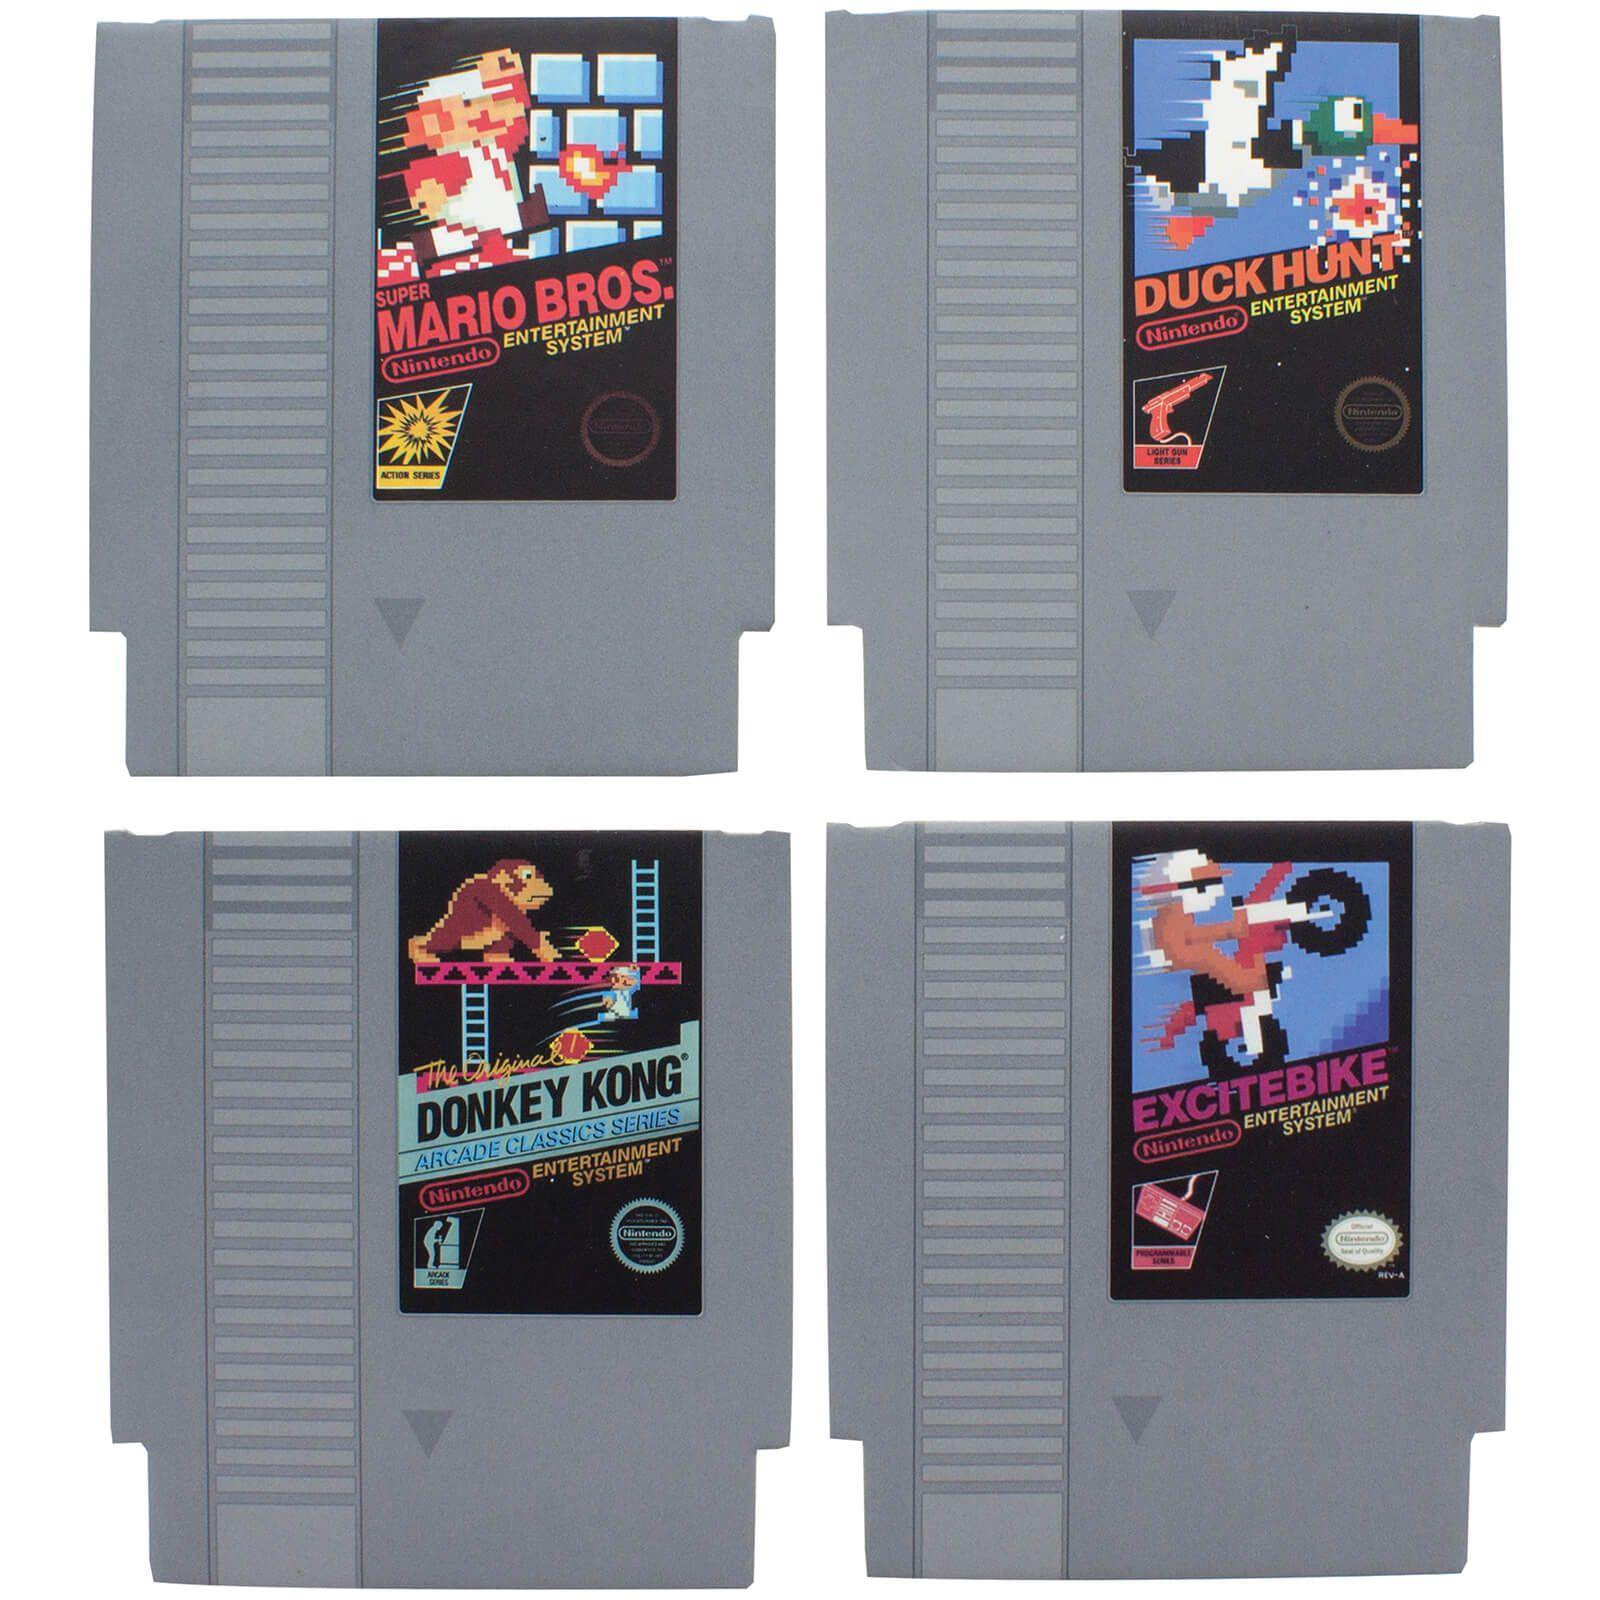 Nintendo Nes Cartridge Coasters In 2020 Nes Cartridge Nintendo Nes Classic Nes Games